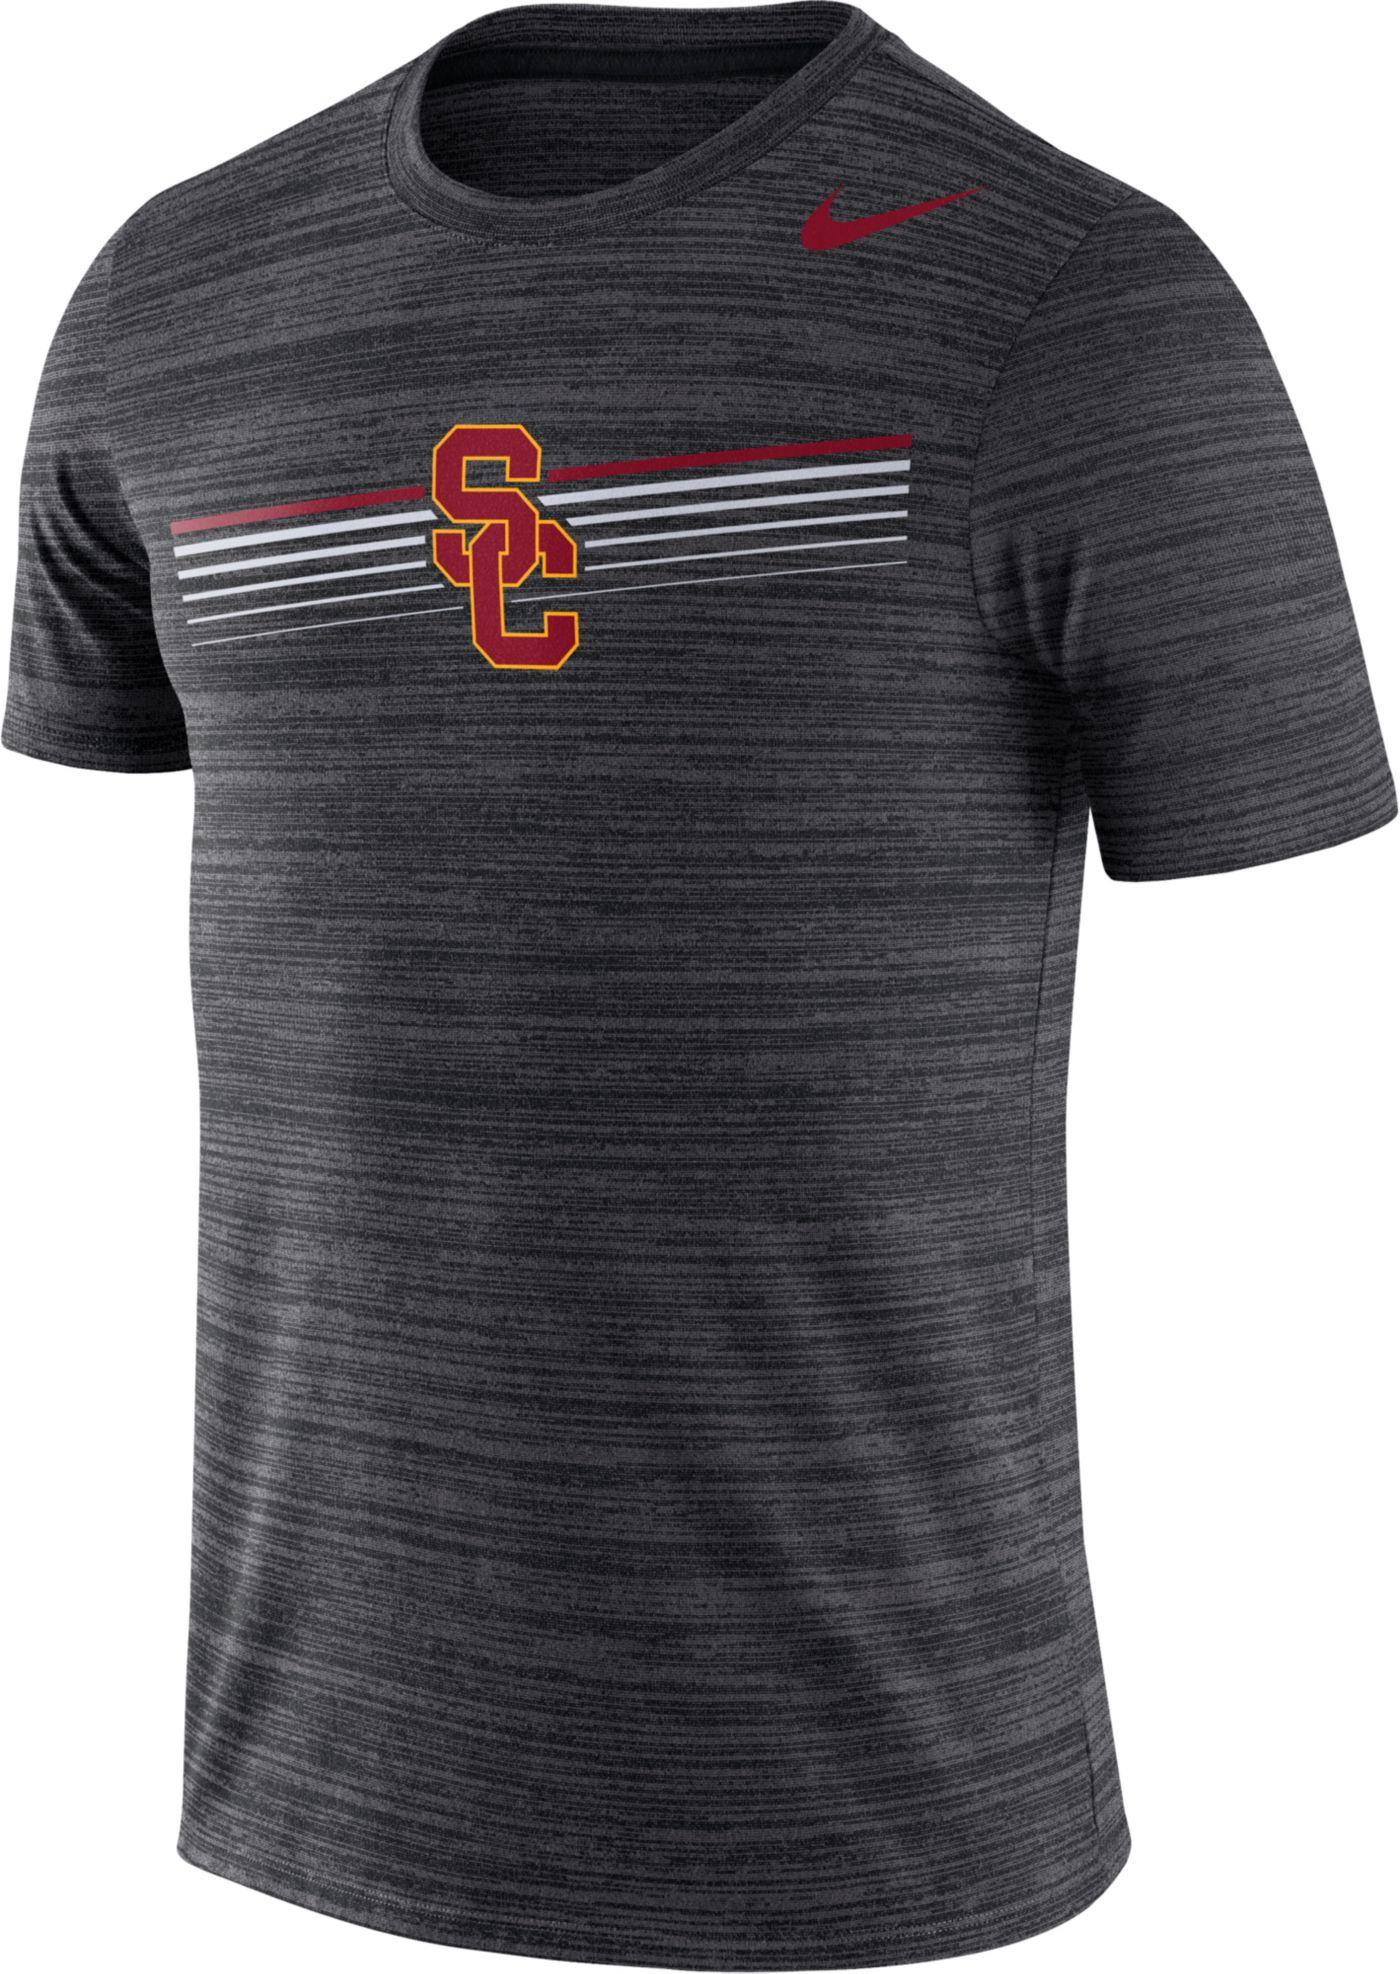 Nike Men's USC Trojans Velocity Legend Graphic Black T-Shirt